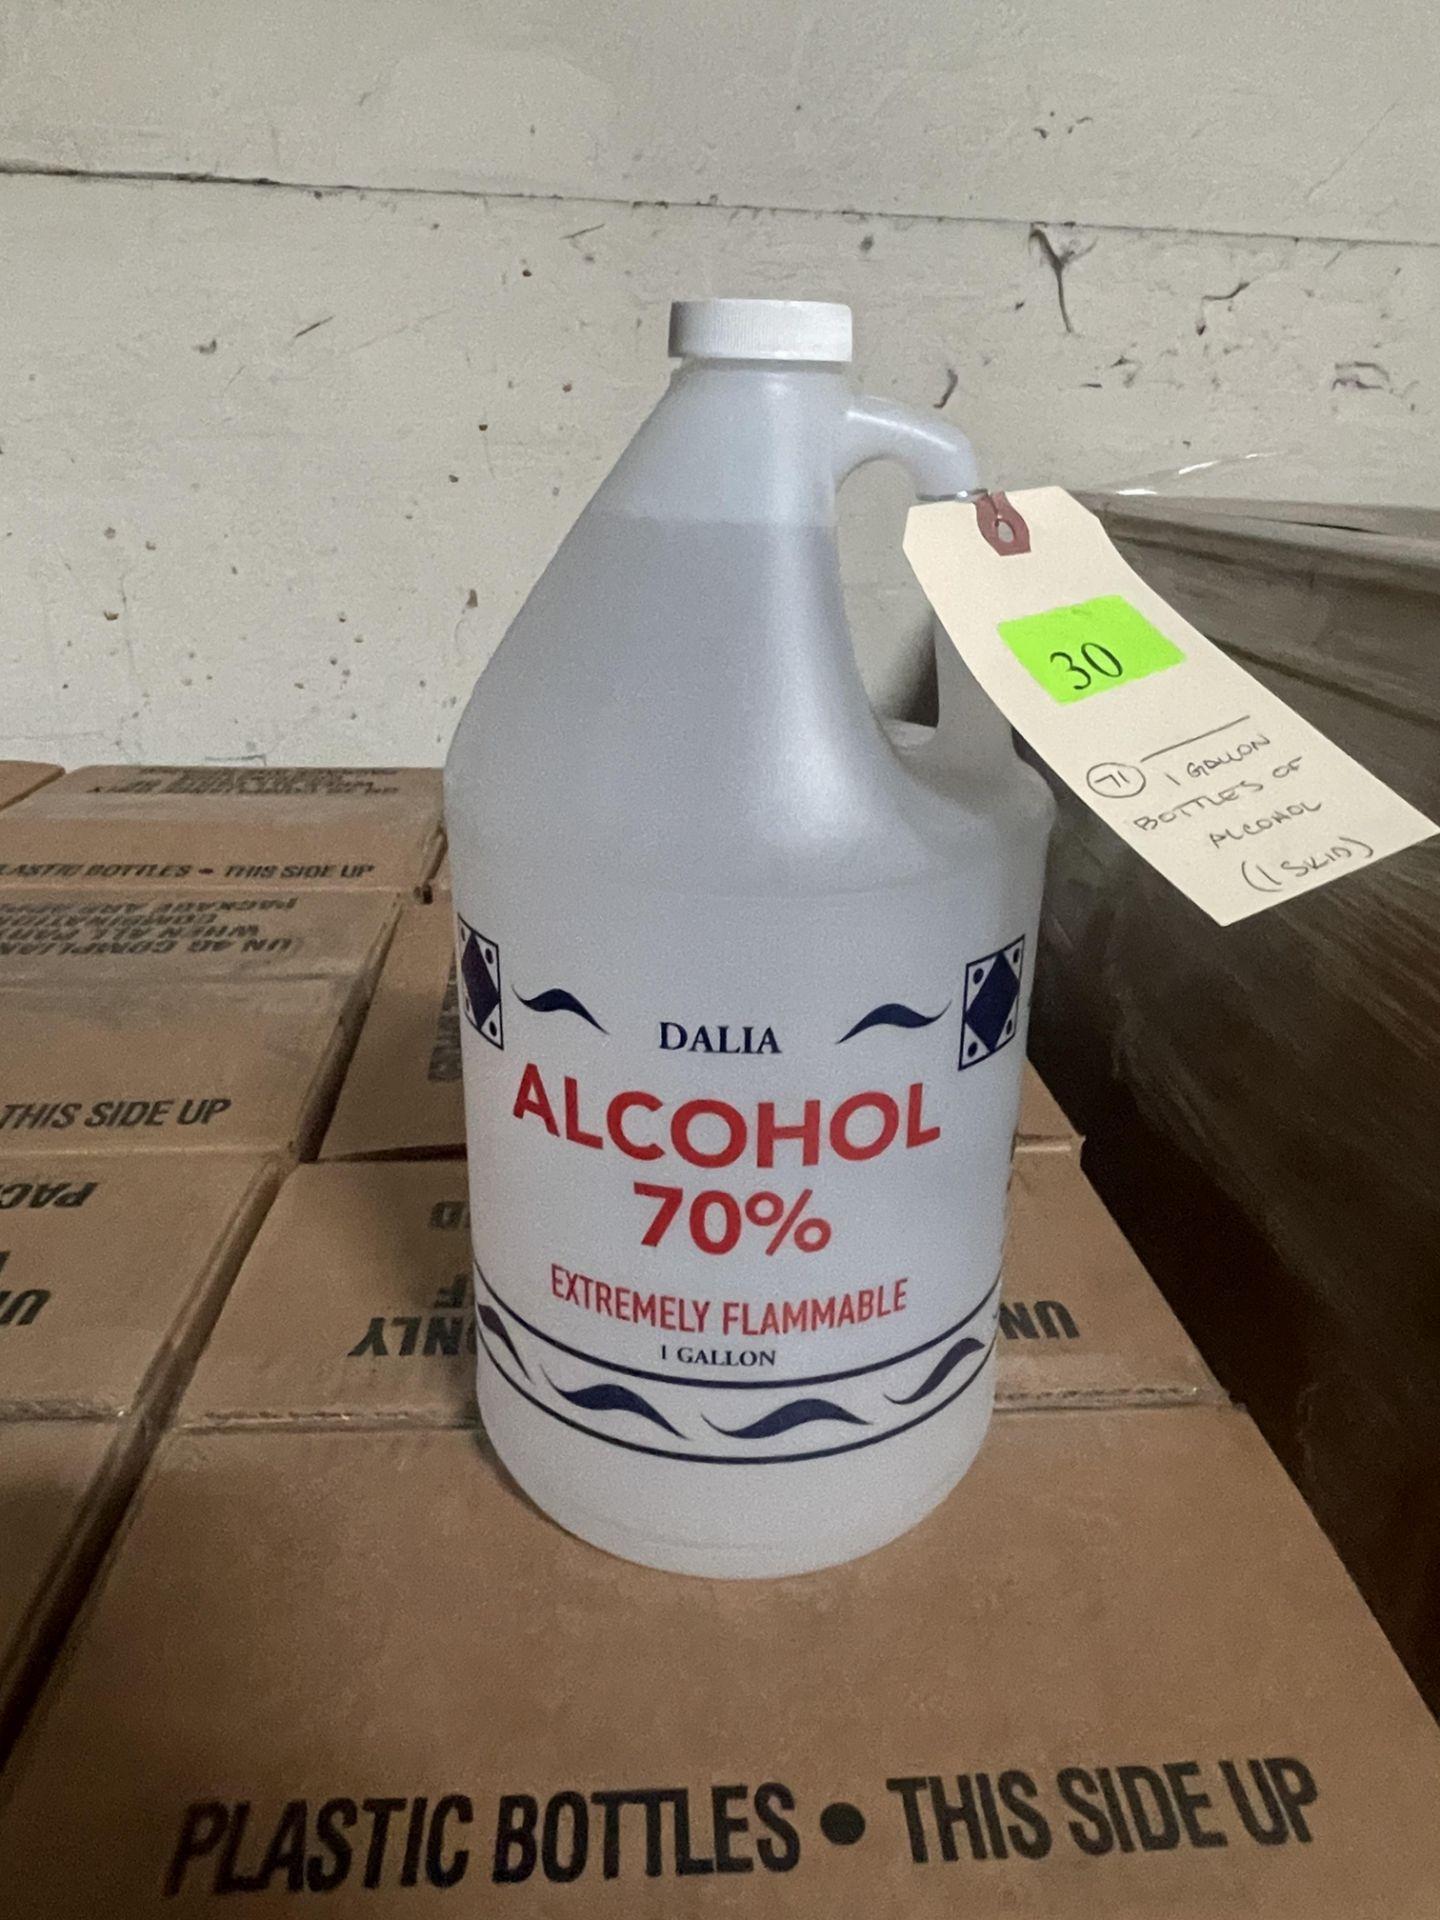 1 GALLON BOTTLES OF ALCOHOL 1 PALLET